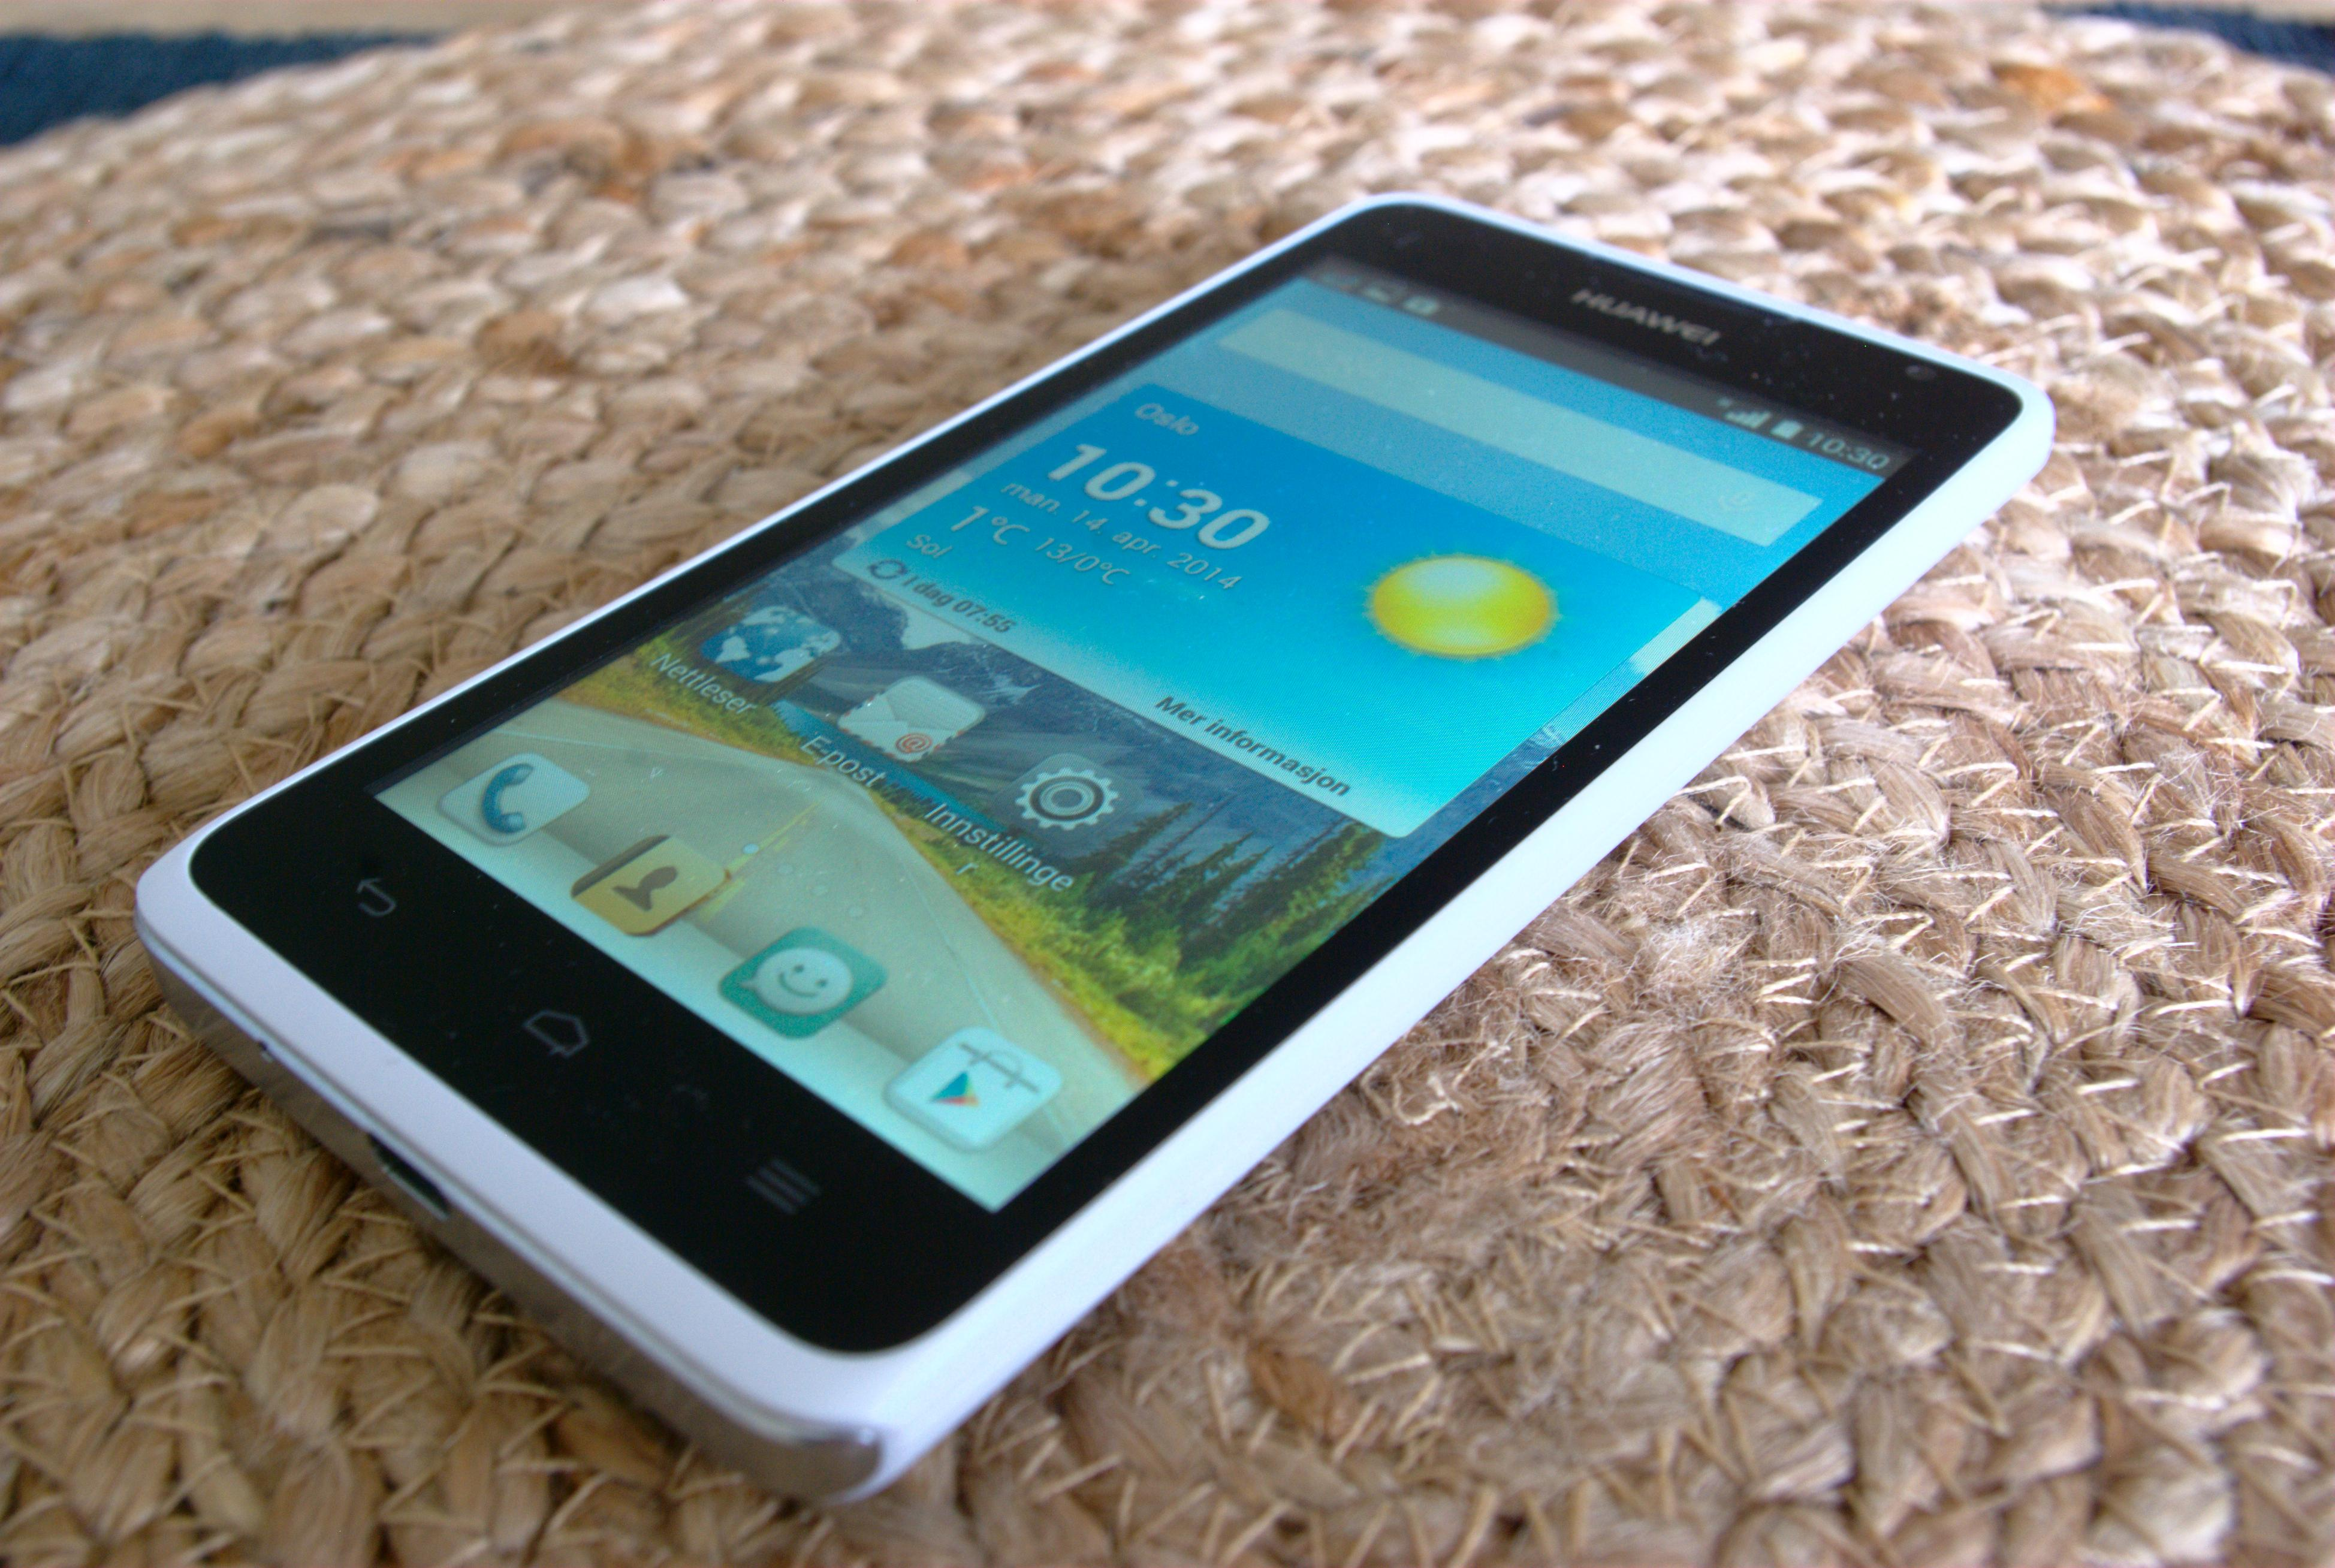 Huawei Y530 er en rimelig og enkel Android-mobil. I skrivende stund kan den kjøpes fra rundt 500 kroner. Foto: Einar Eriksen, Tek.no